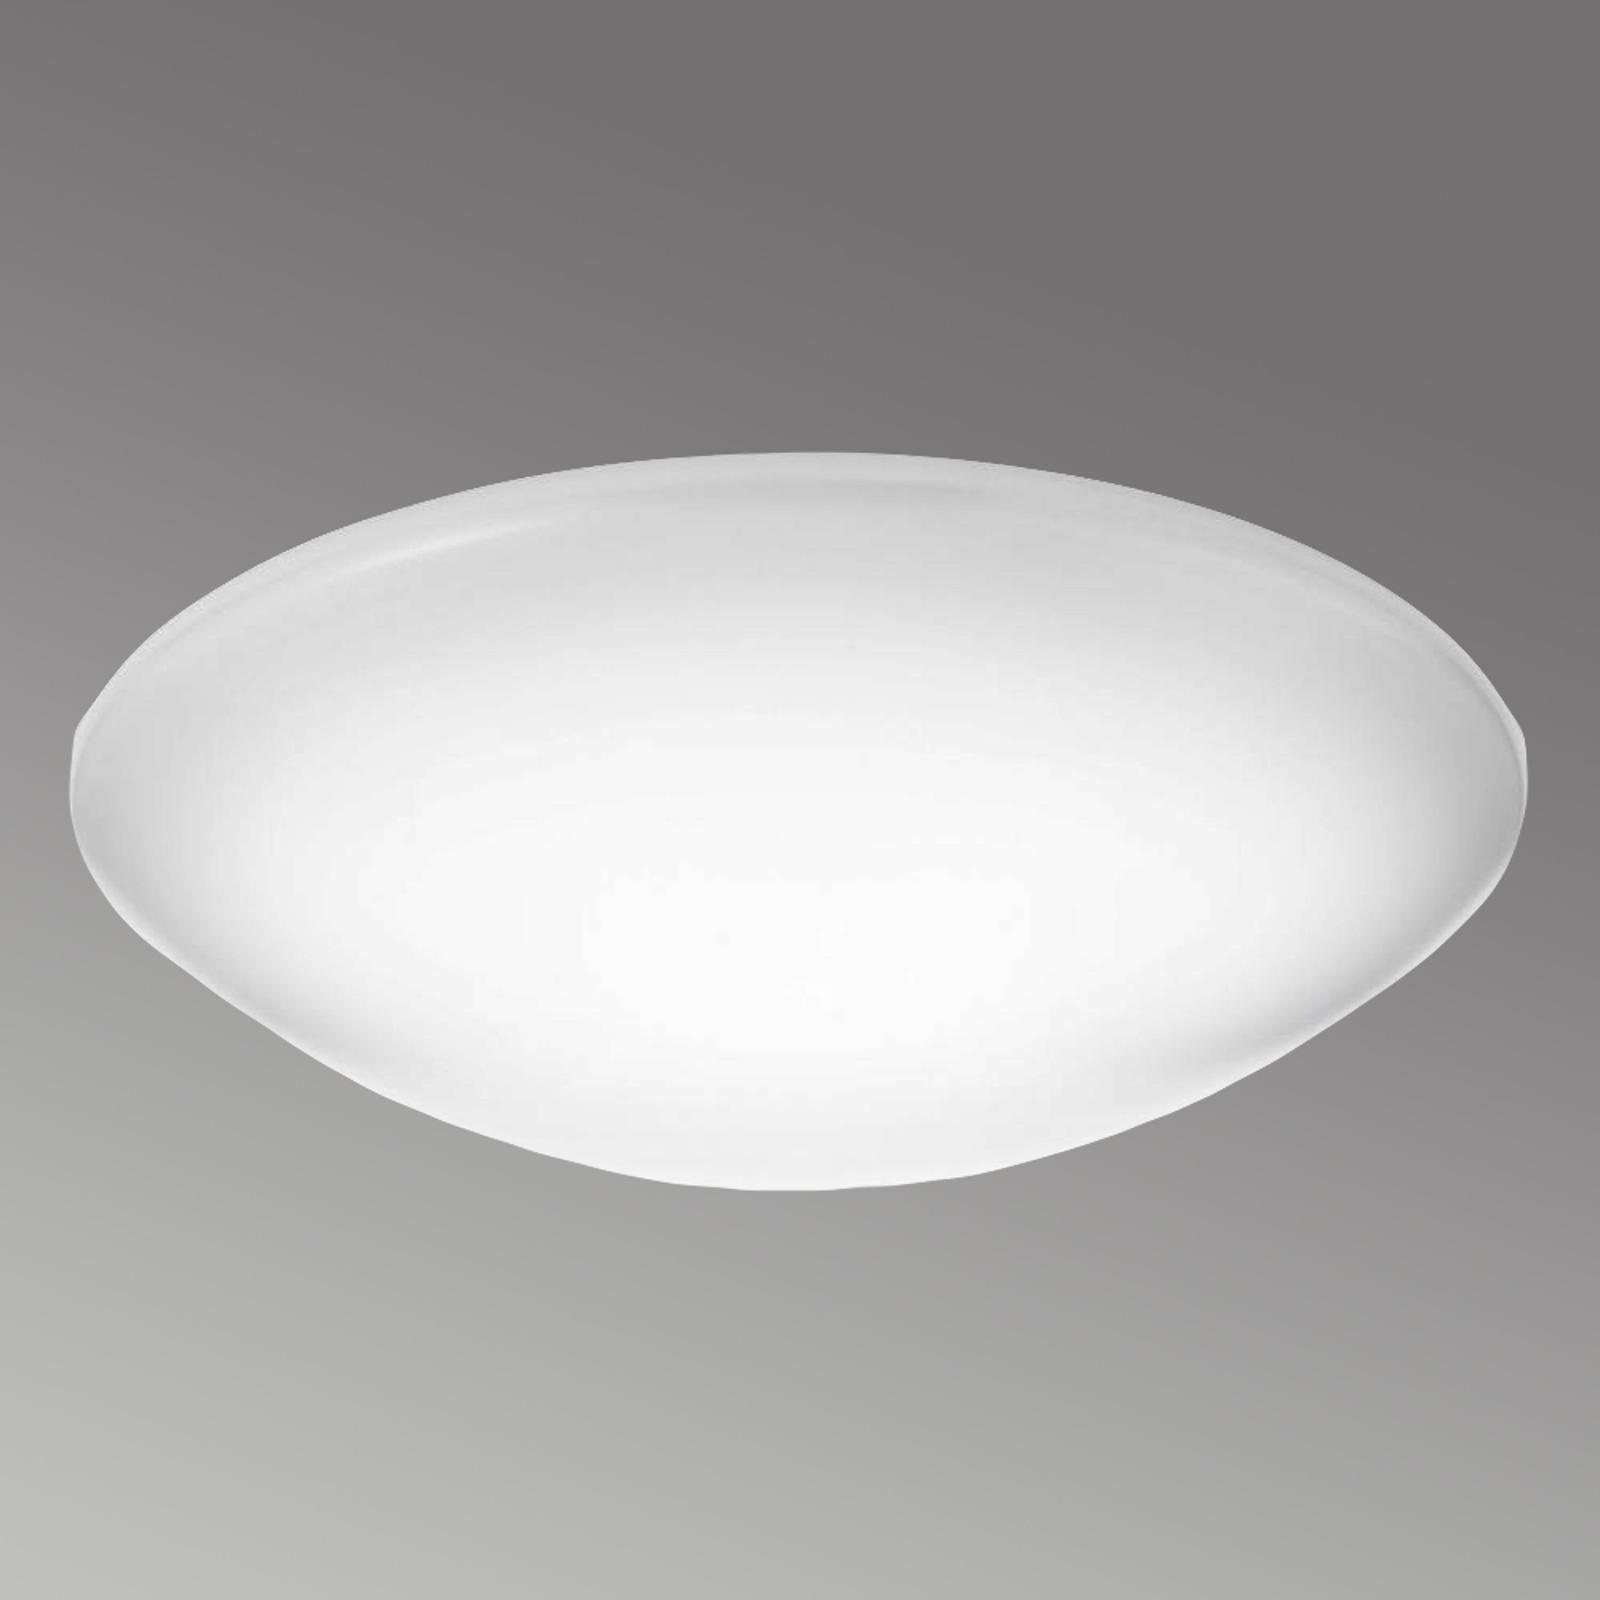 Plafoniera a LED Suede in plastica